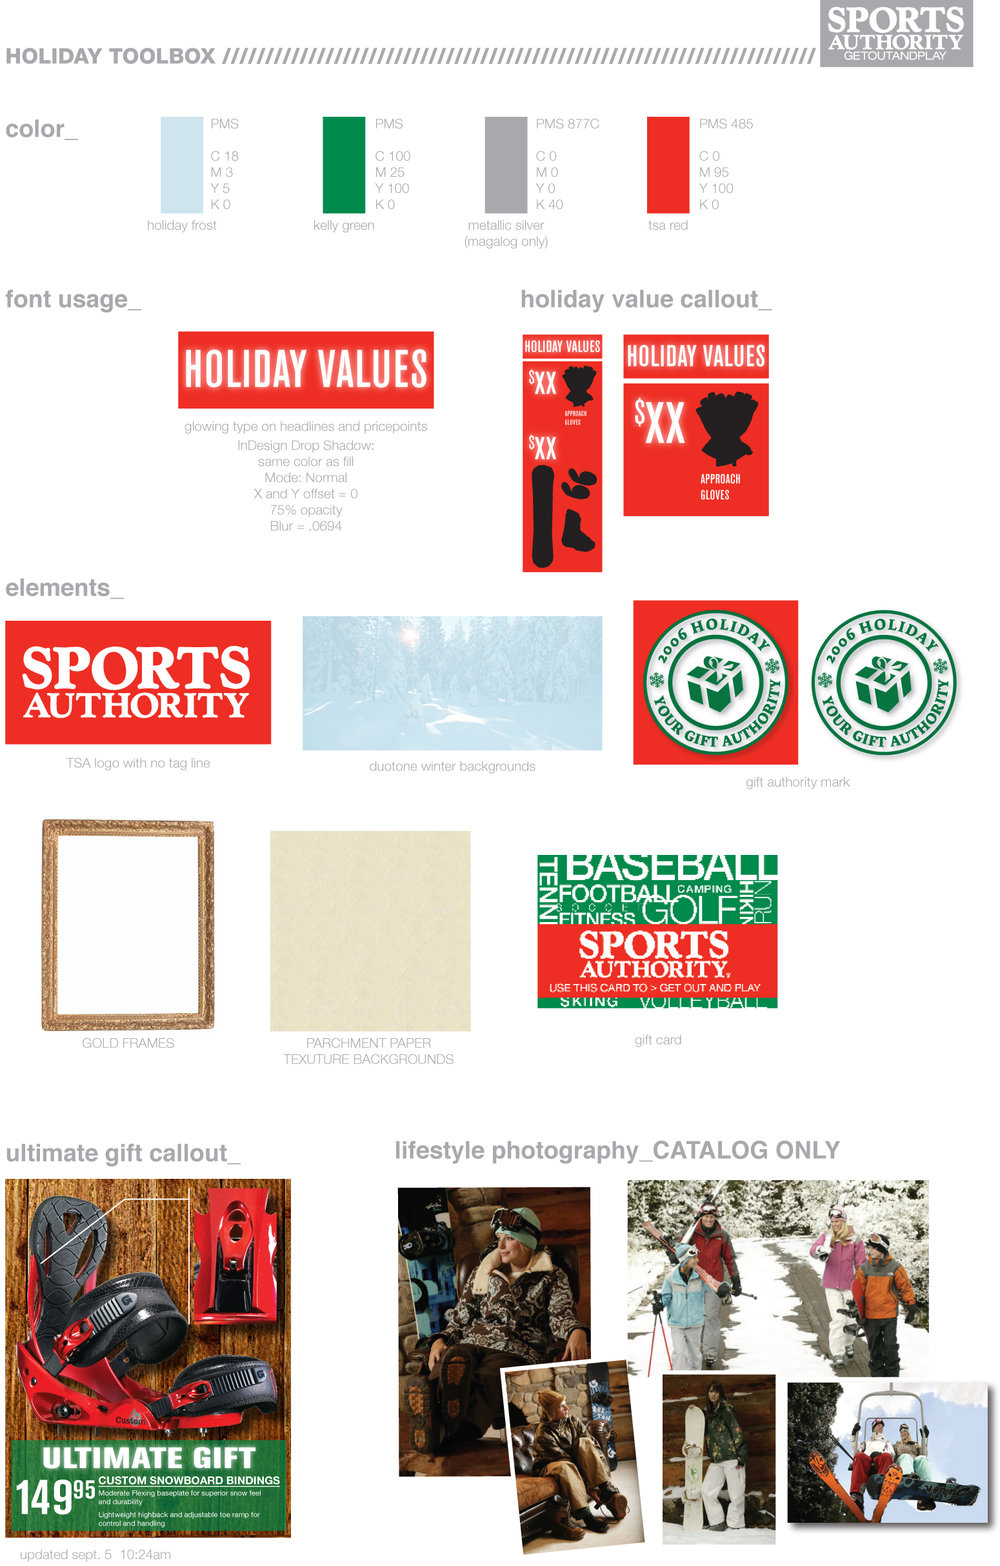 holiday-toobox.jpg